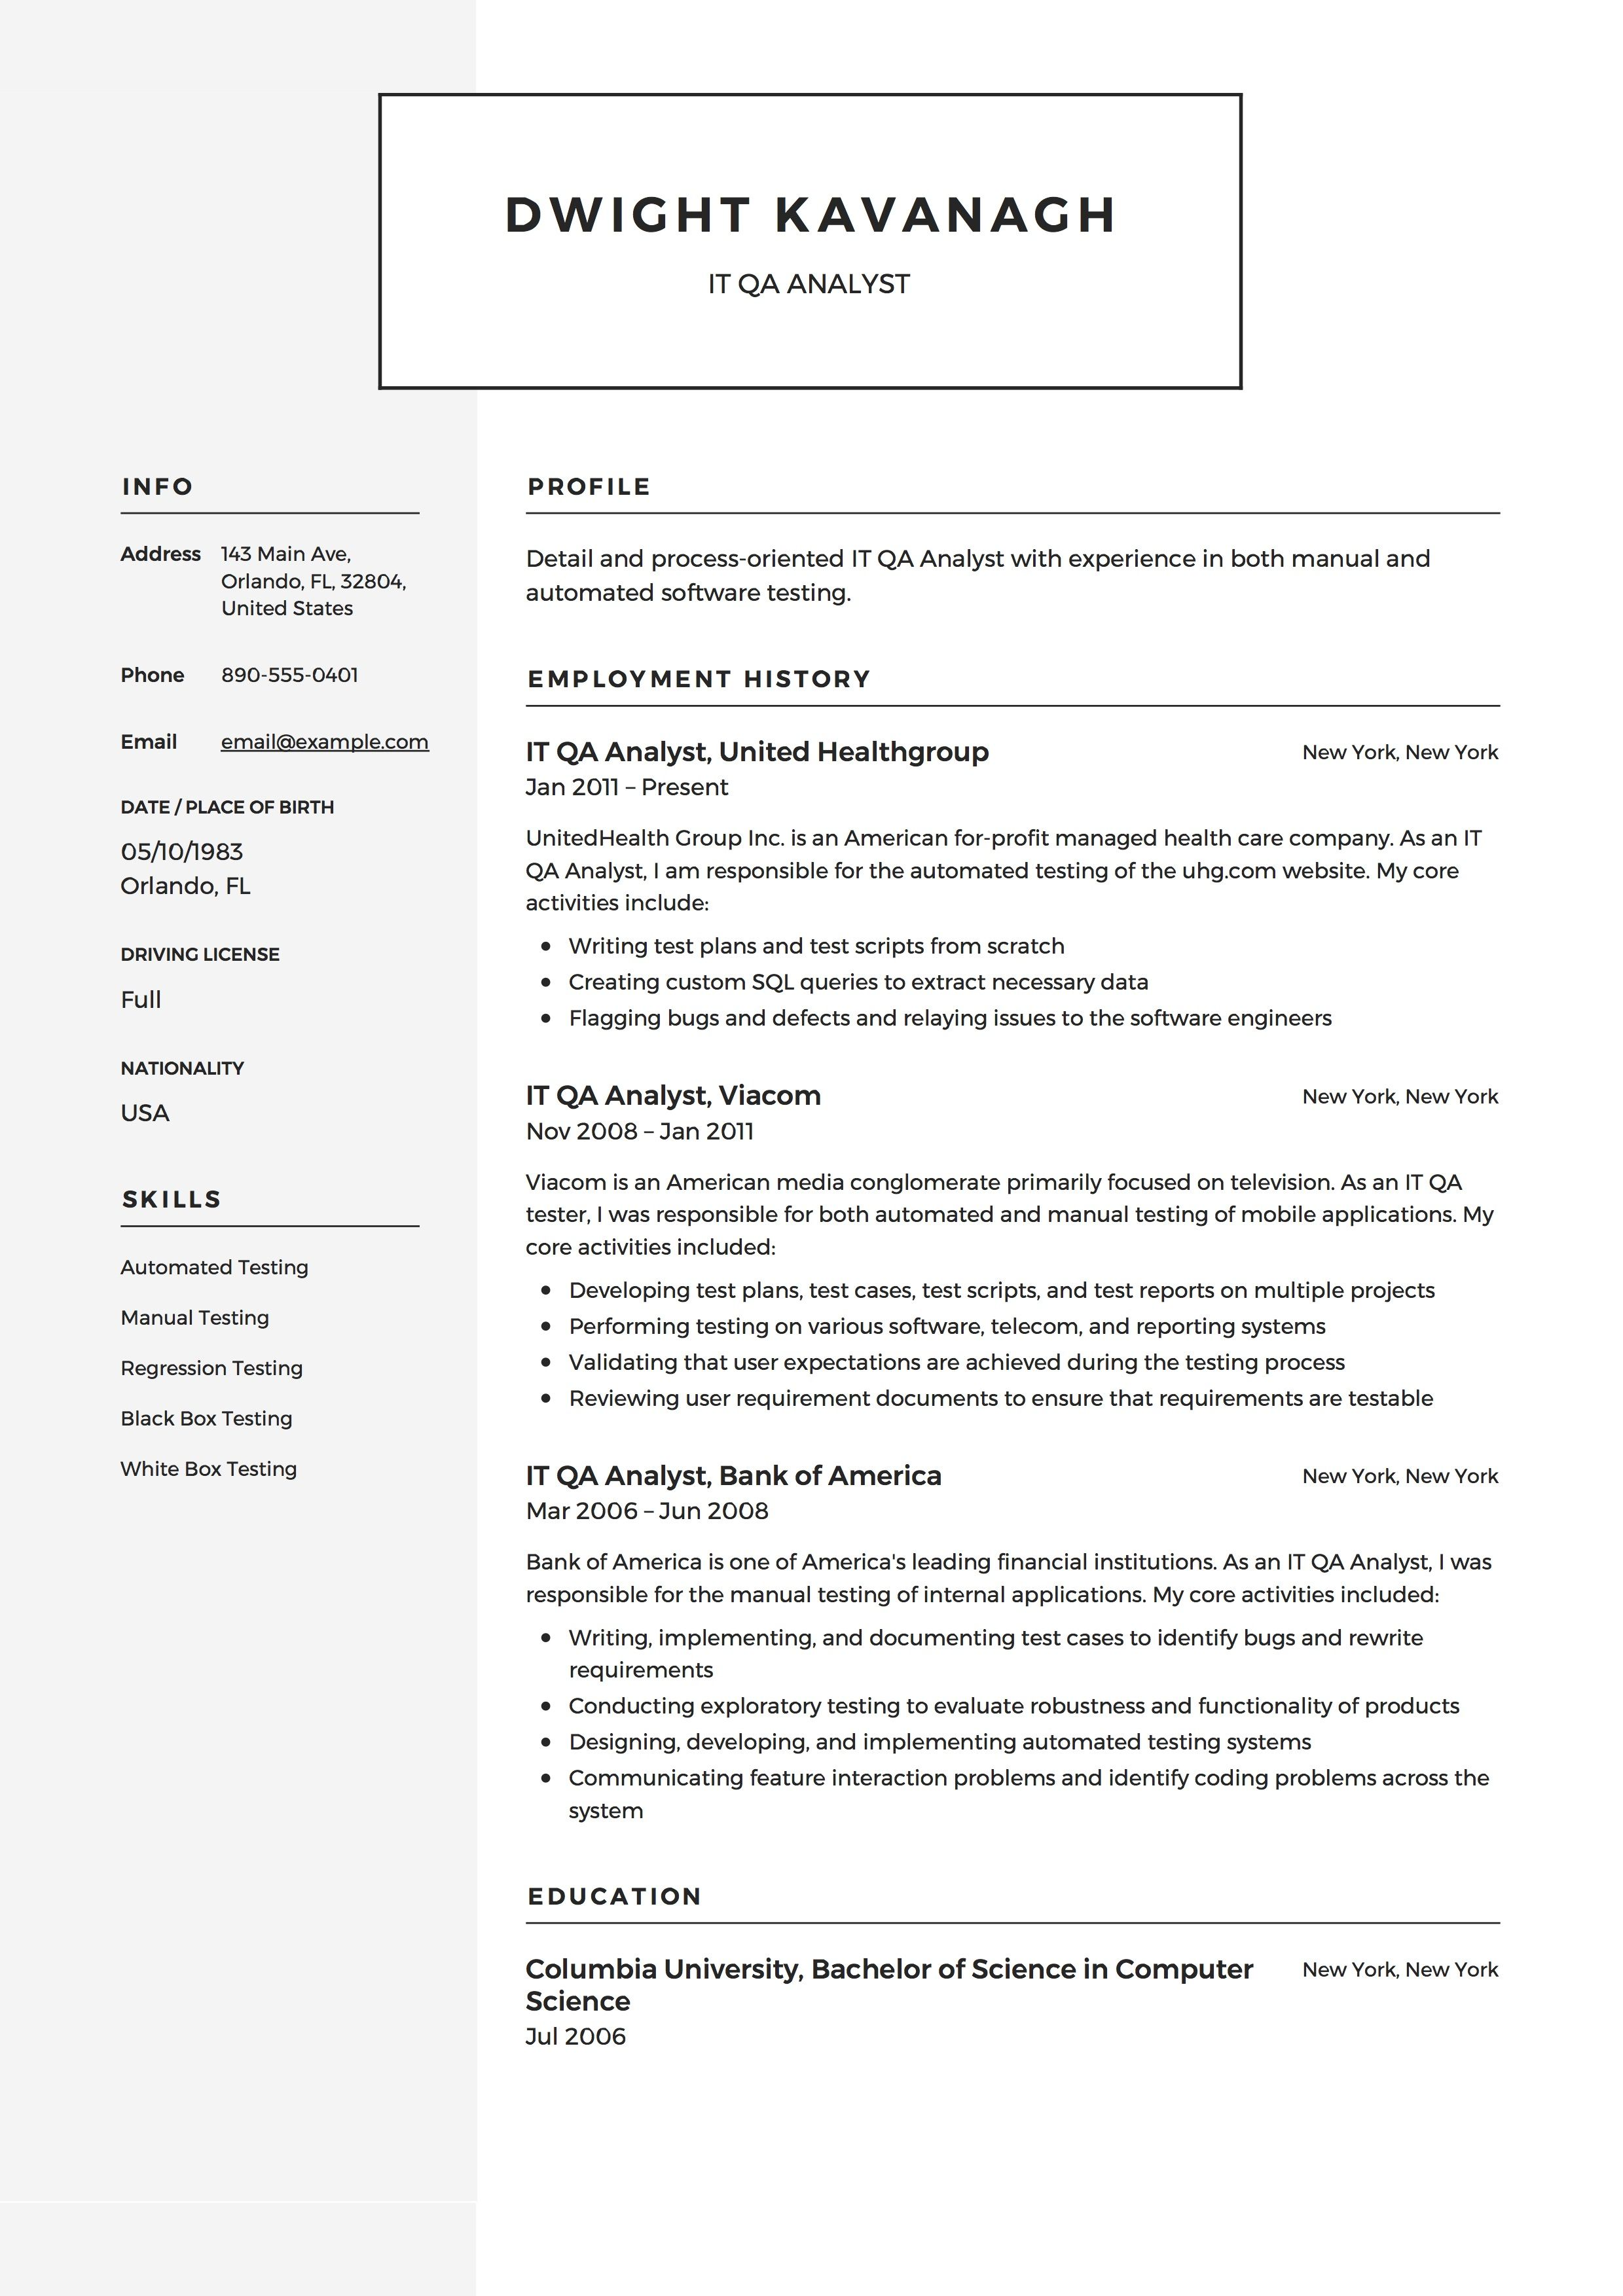 IT QA Analyst Resume Example, Template, Sample, CV, Formal